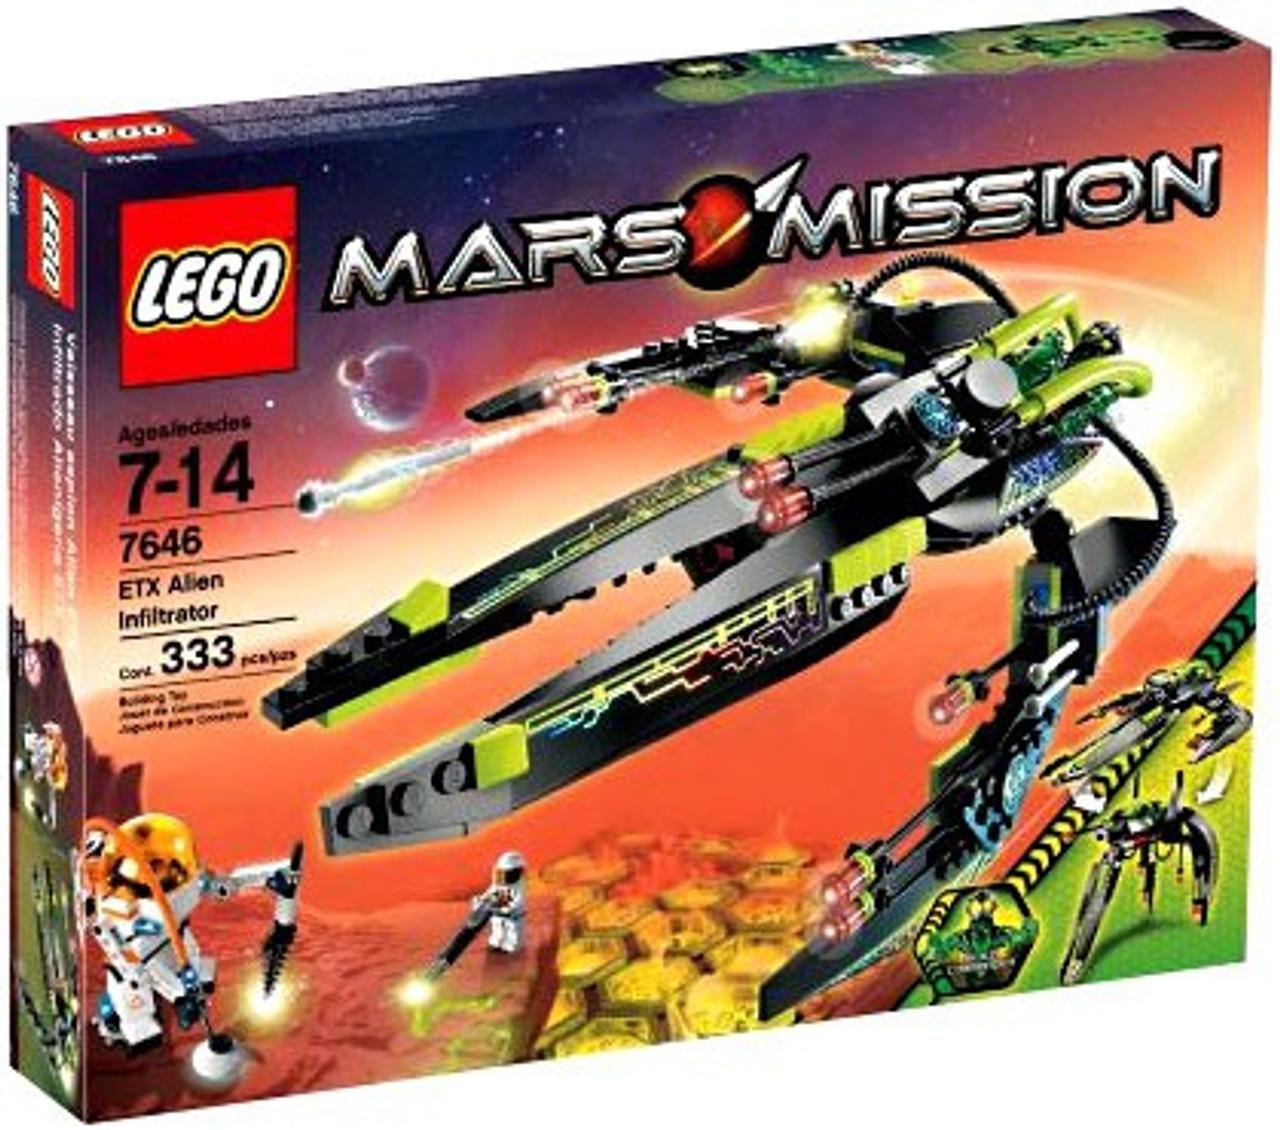 LEGO Mars Mission ETX Alien Infiltrator Set #7646